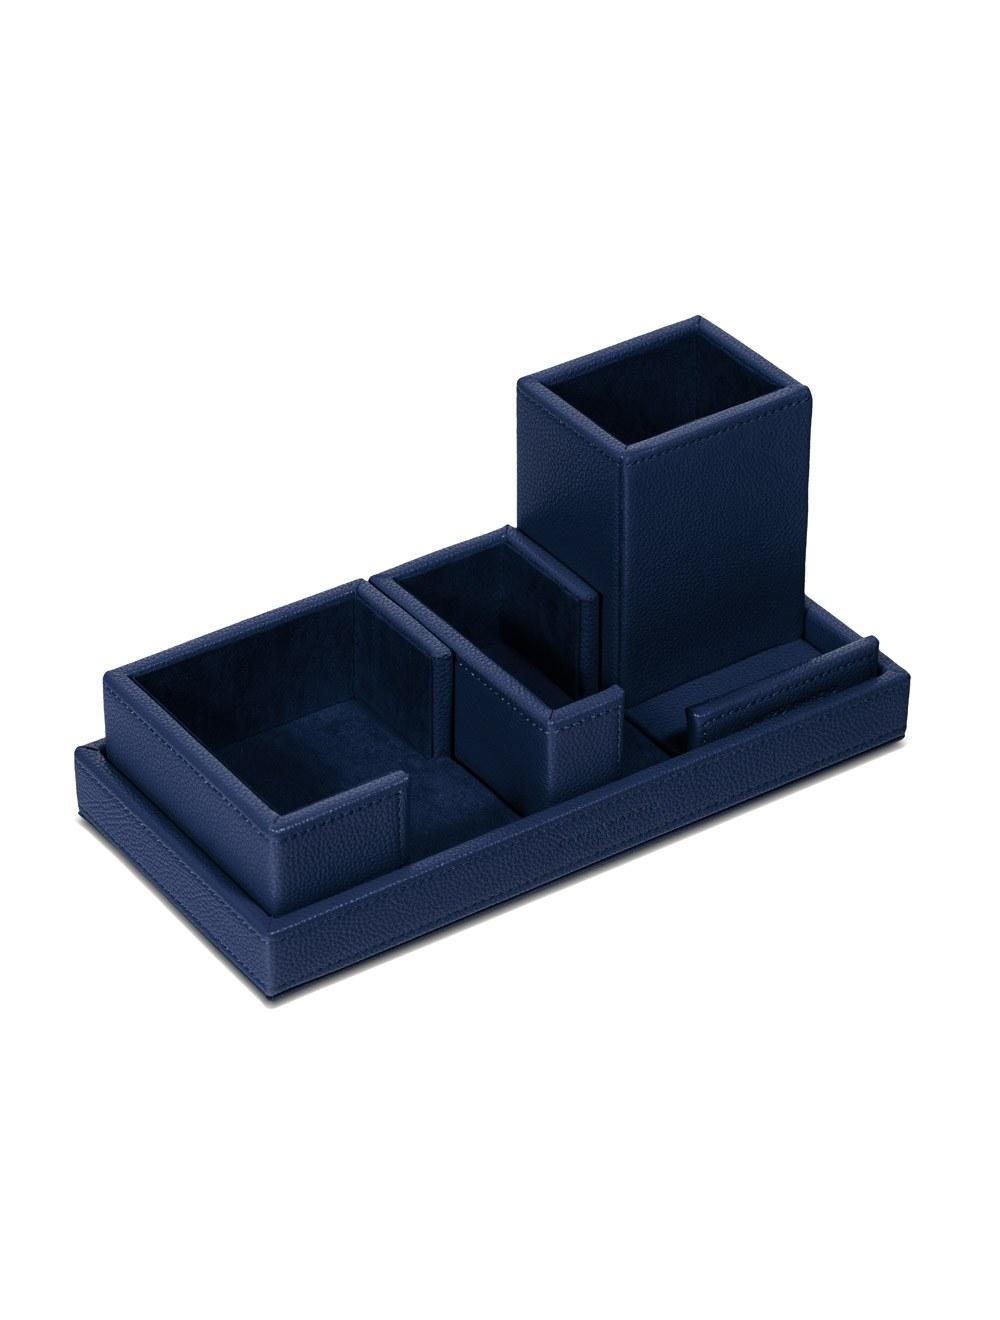 Desk Set Cartesio - Ocean Blue